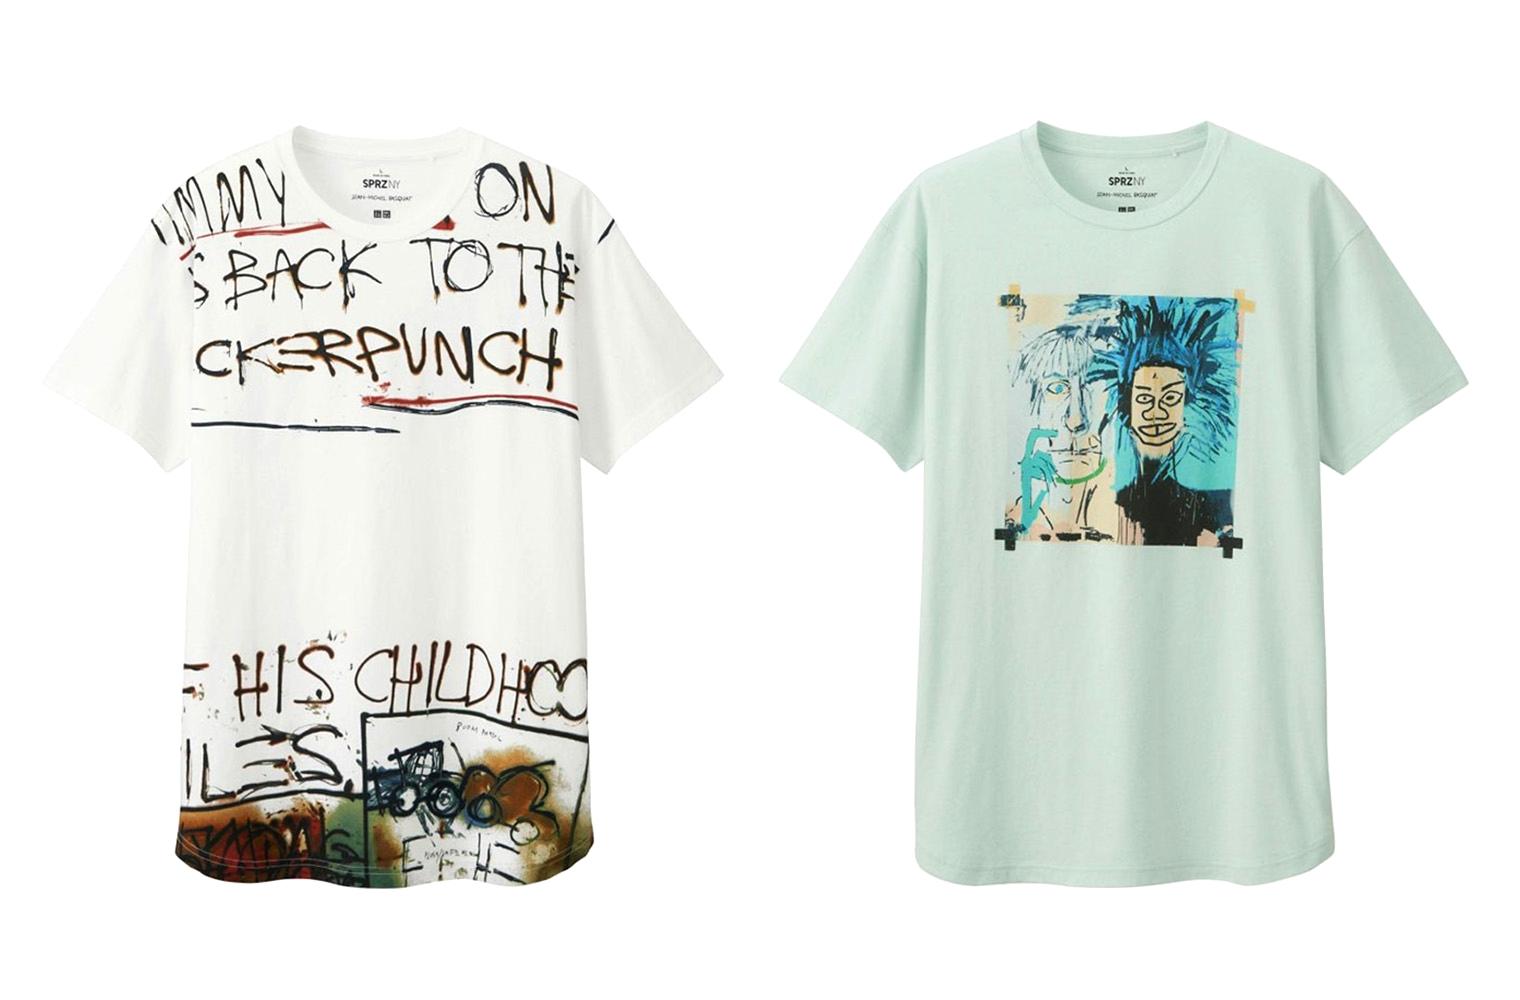 Uniqlo SPRZ NY x Jean-Michel Basquiat Spring/Summer 2016